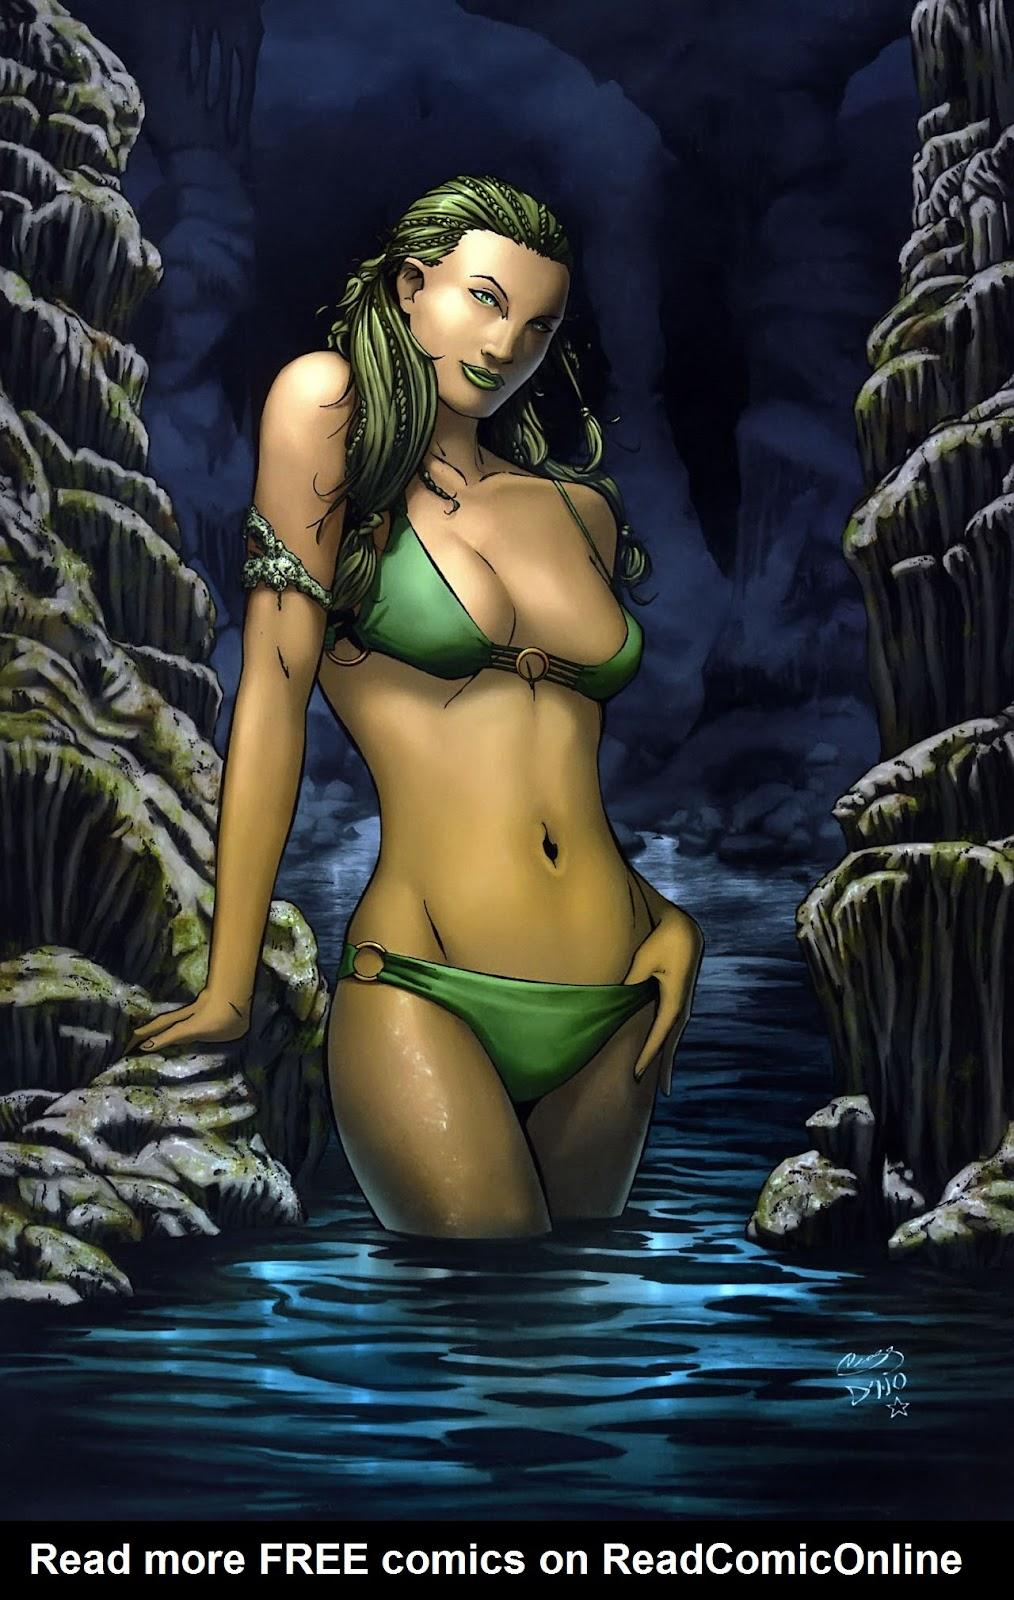 Read online Aspen Splash: Swimsuit Spectacular comic -  Issue # Issue 2008 - 21